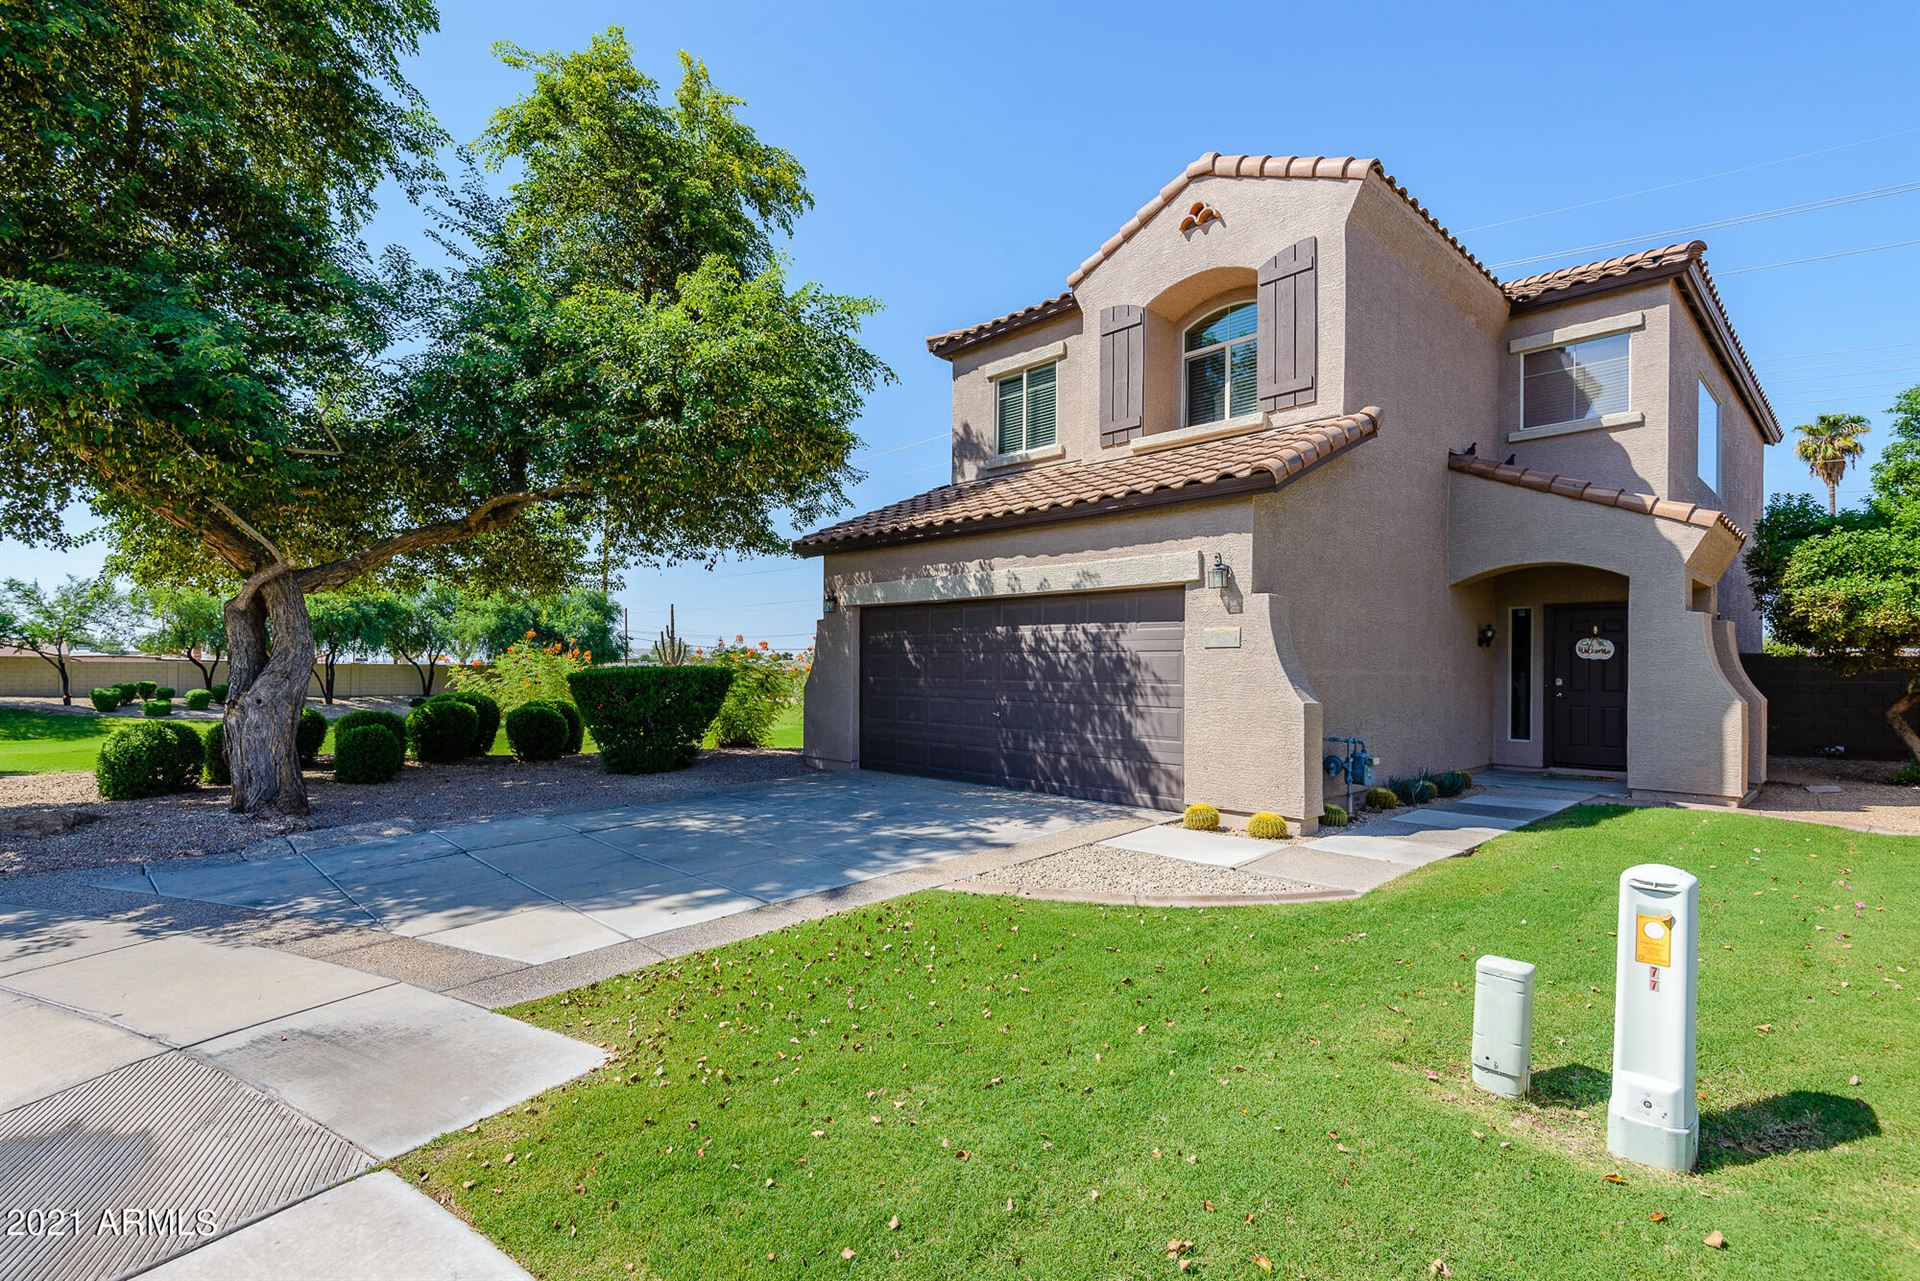 Photo of 10809 E BOSTON Street, Apache Junction, AZ 85120 (MLS # 6291901)